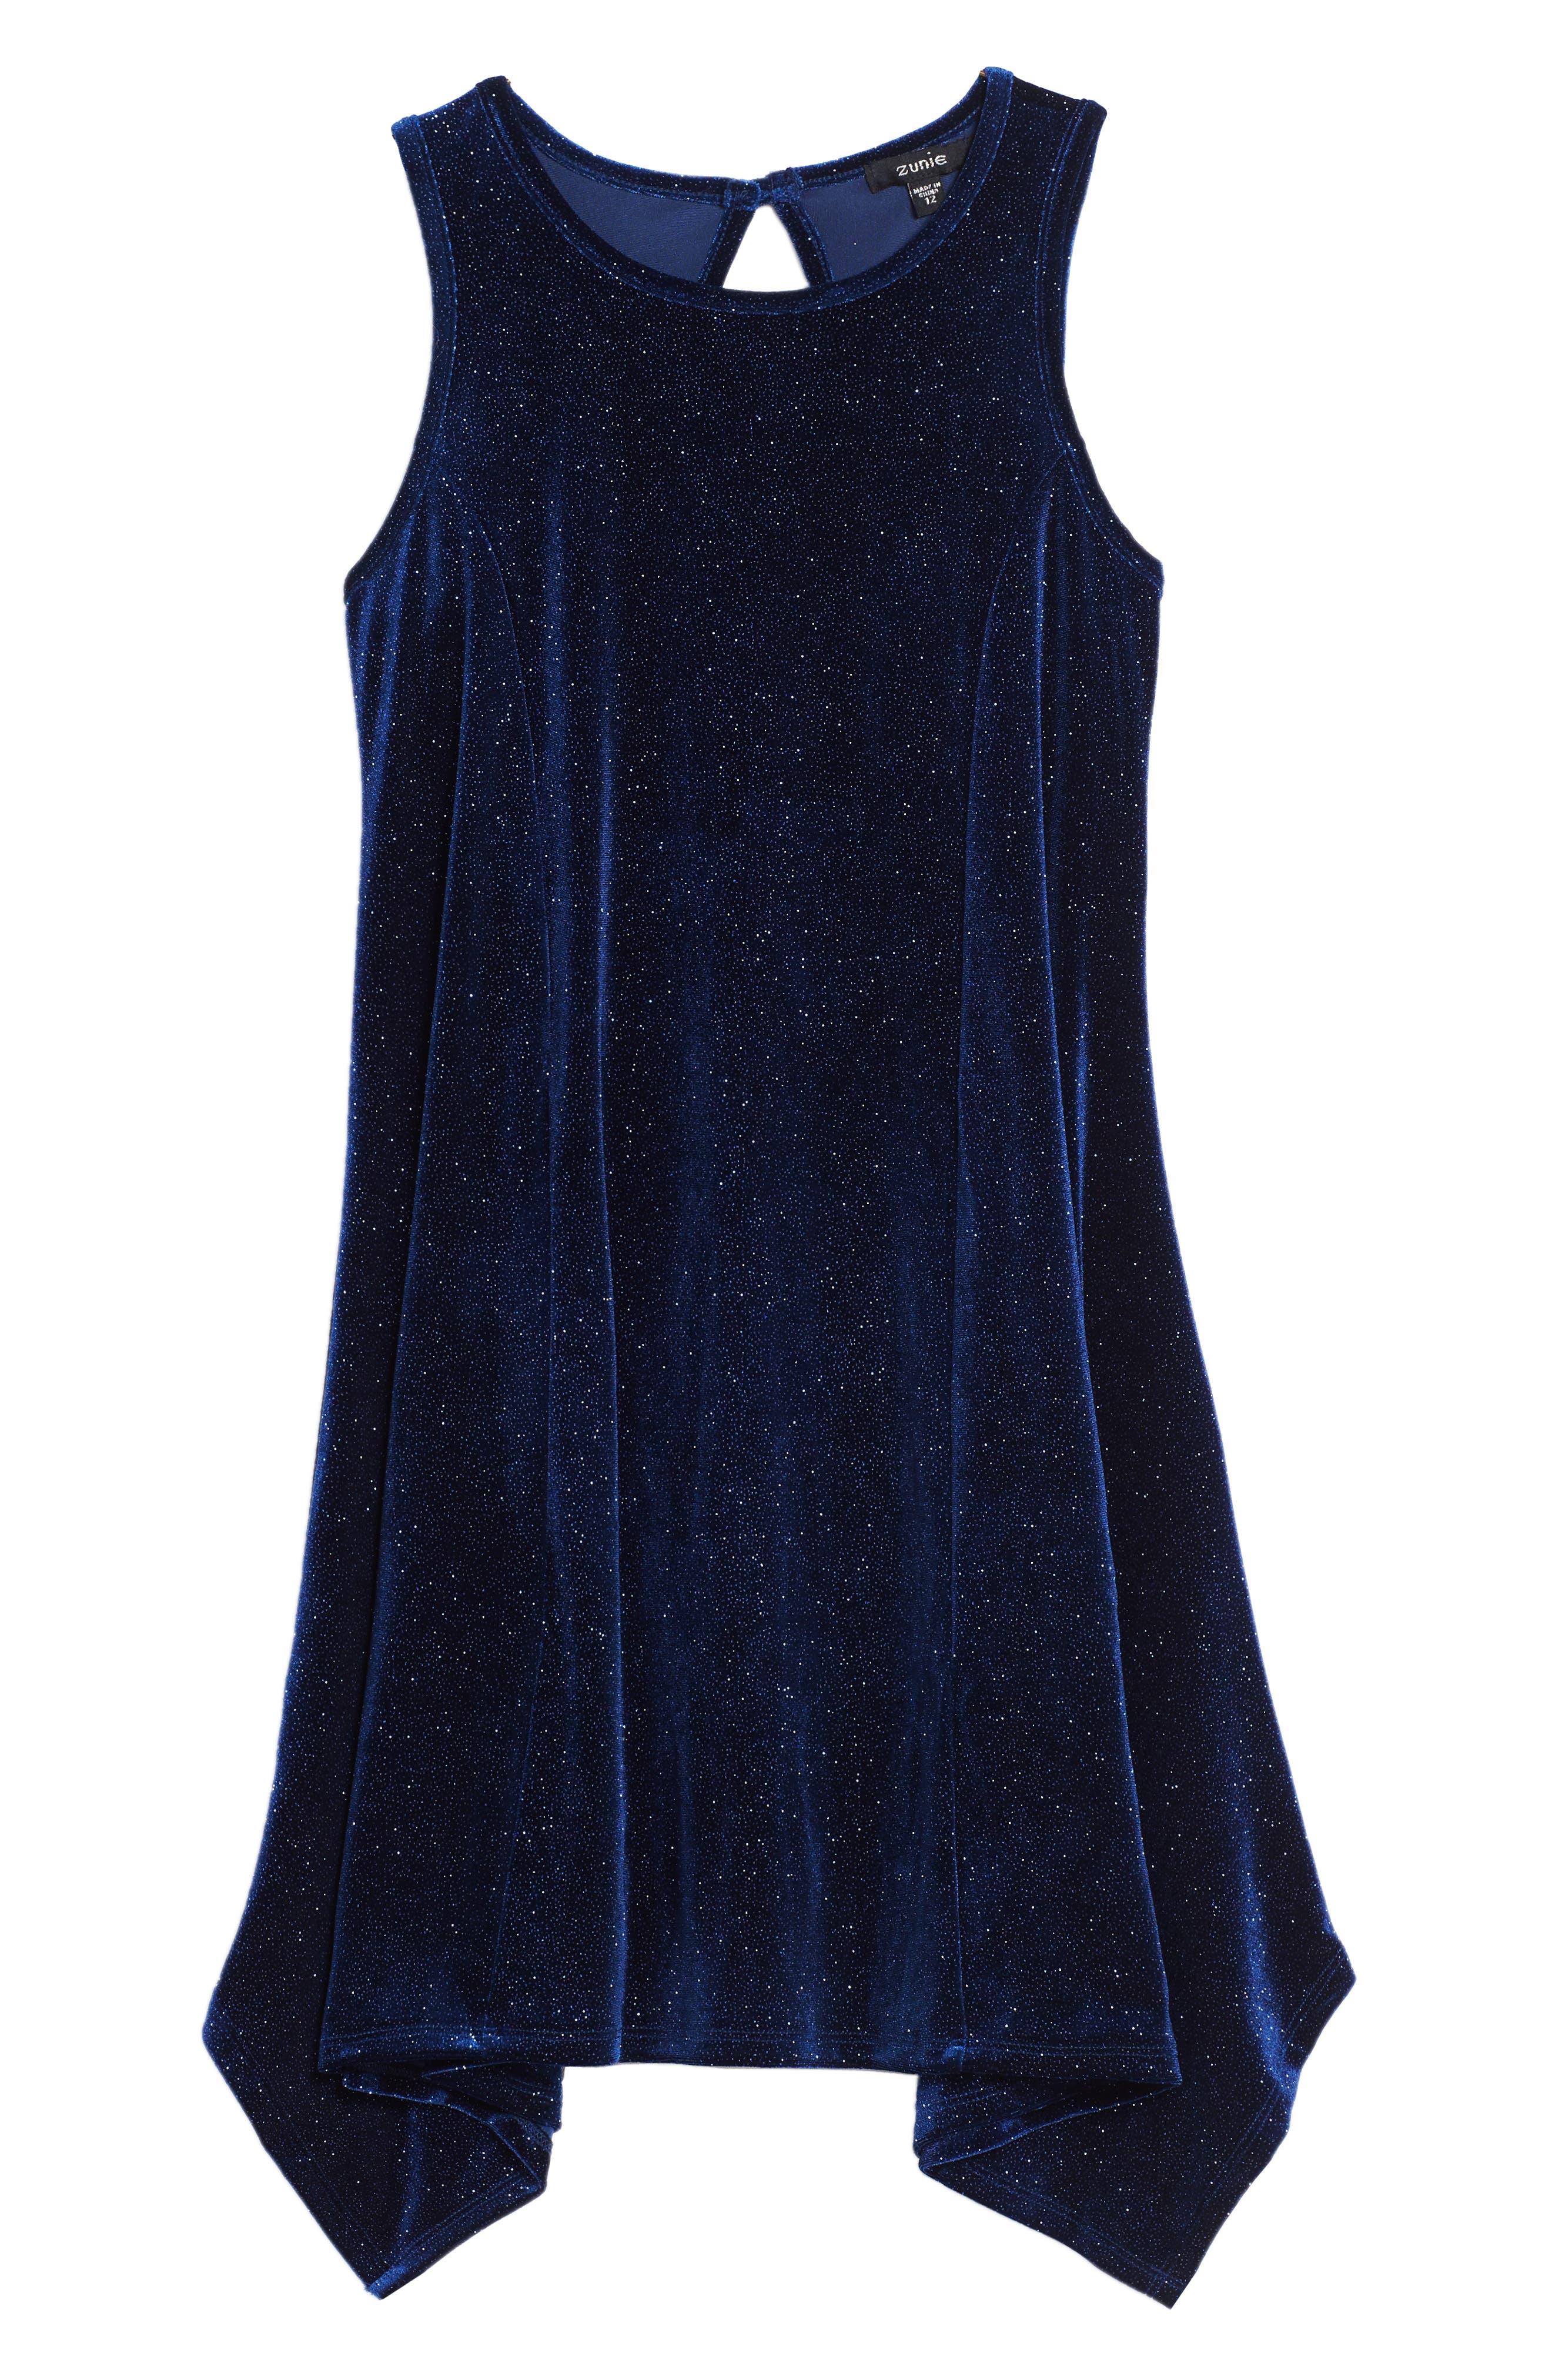 Alternate Image 1 Selected - Zunie Shimmer Sharkbite Dress (Big Girls)